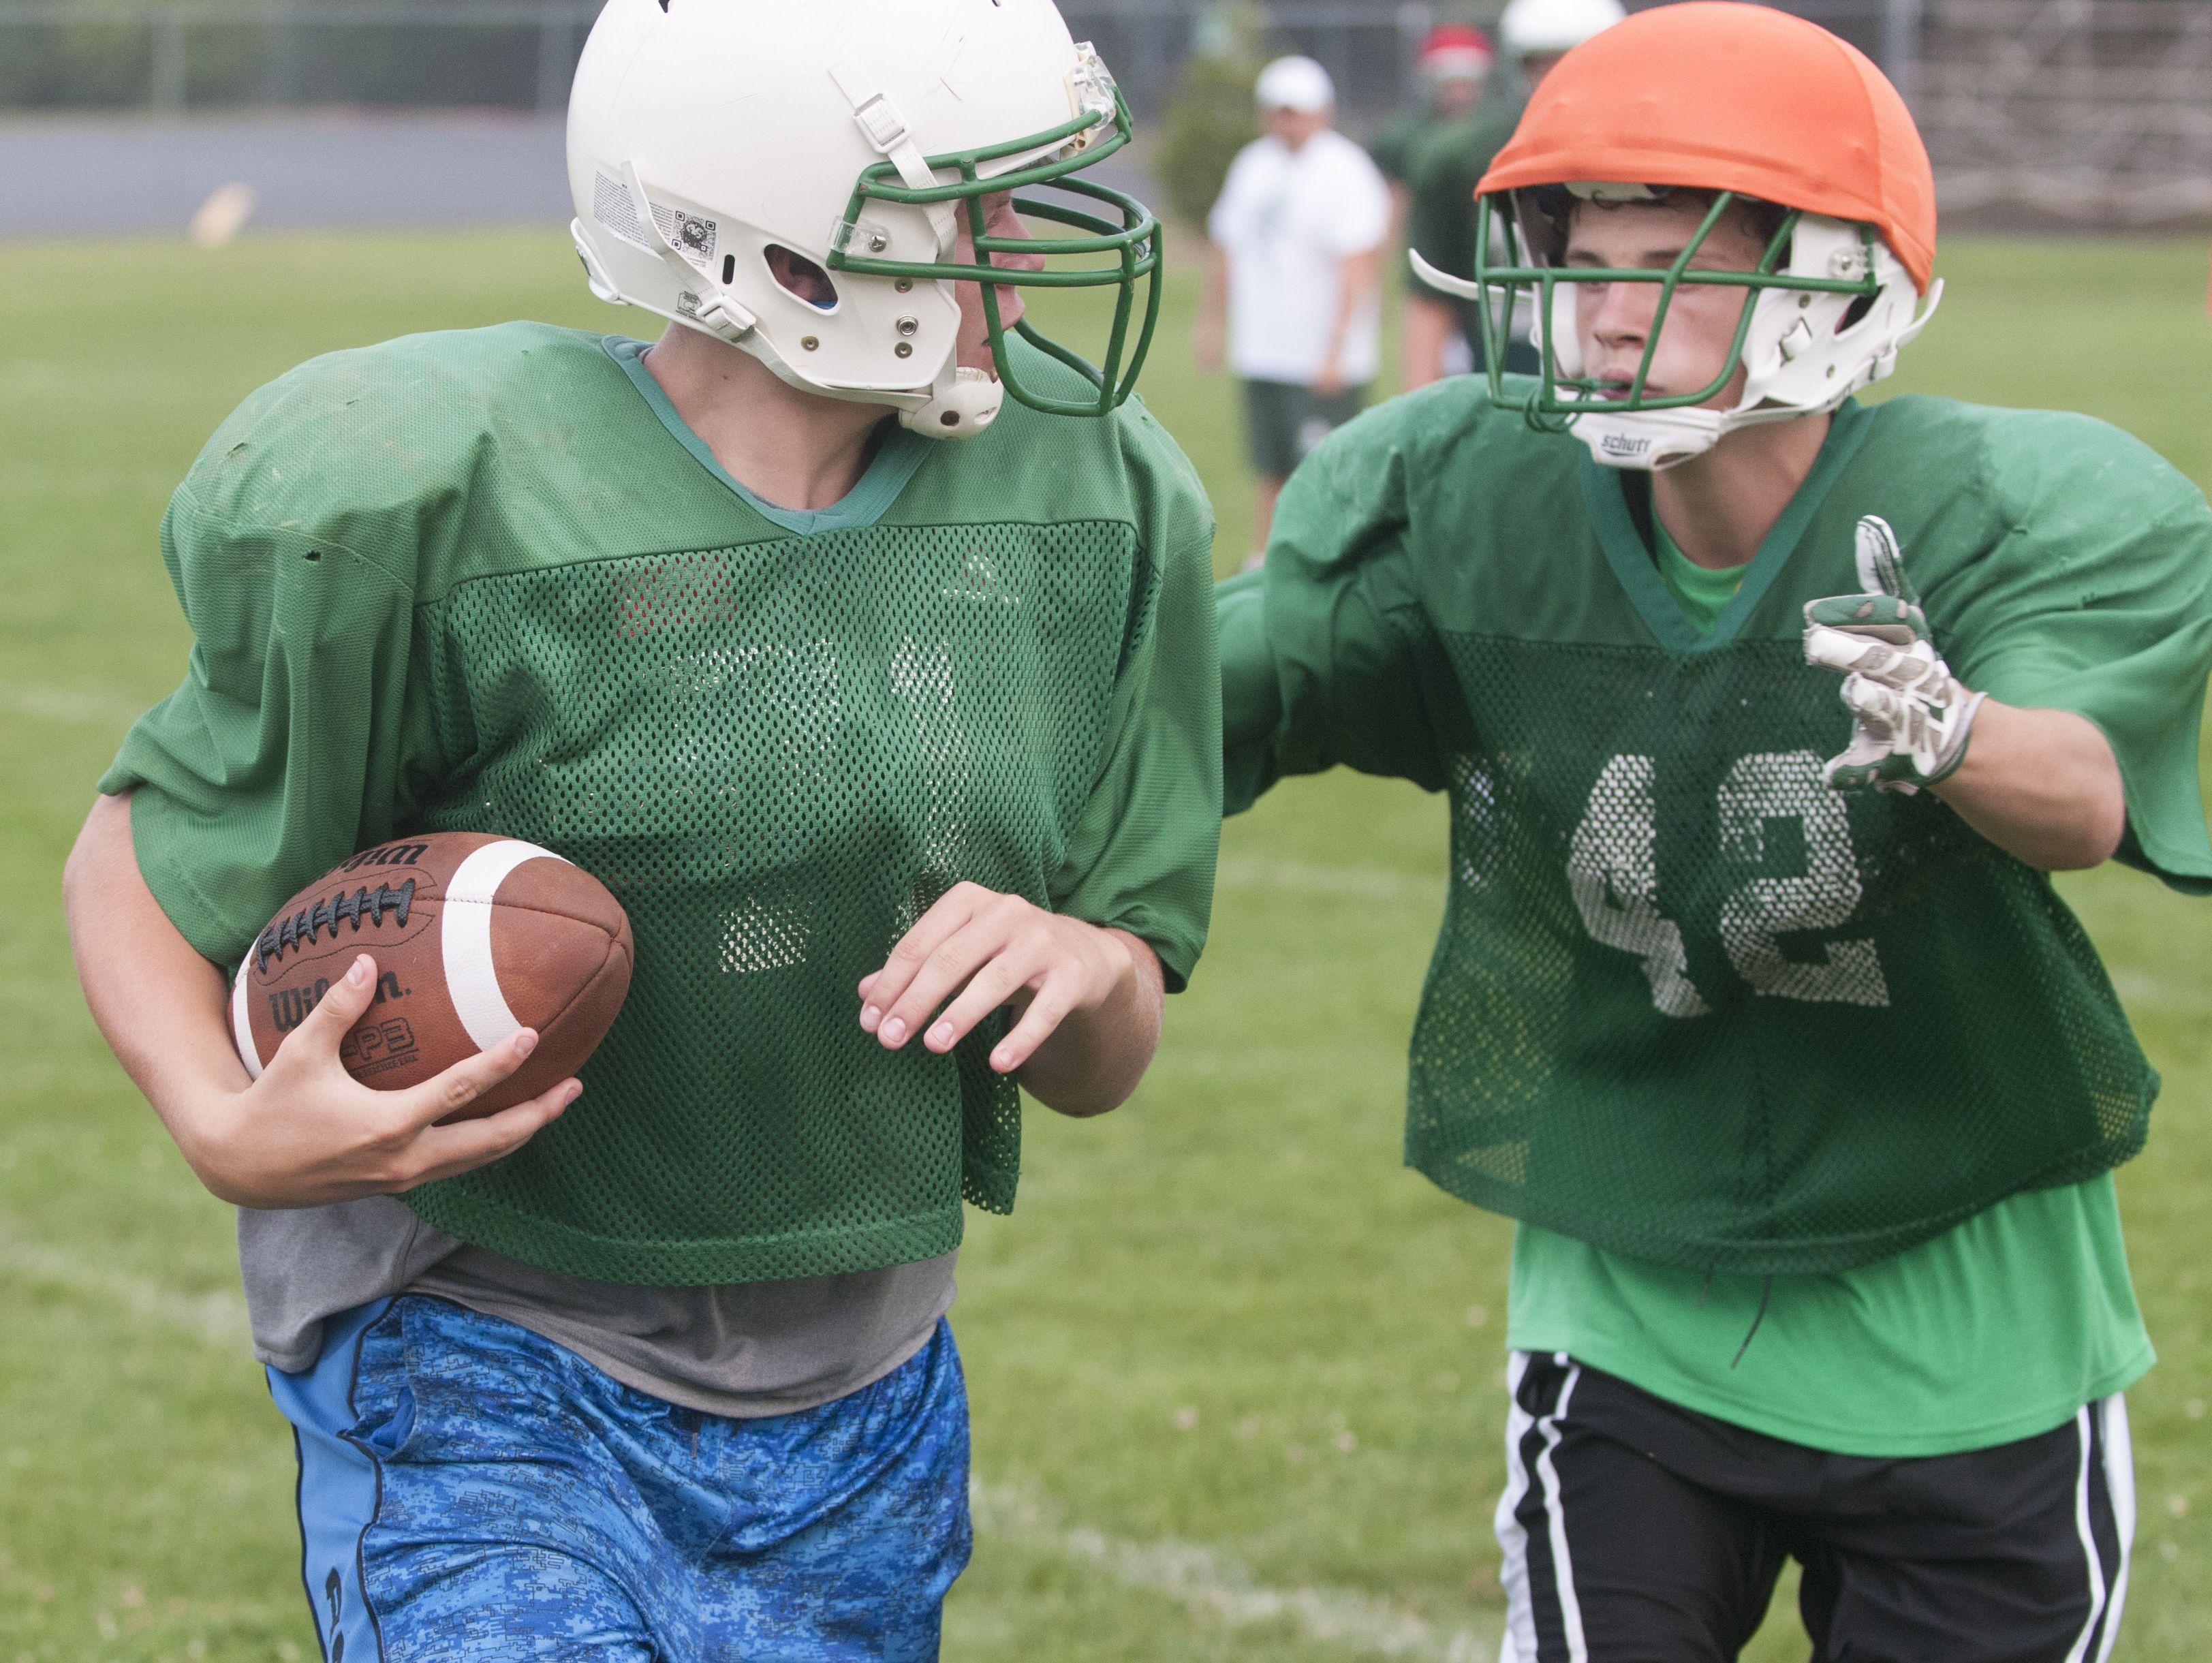 Brown City's David Halbert runs the ball as Sebastian Blevins follows Thursday, Aug. 11, 2016 during their football practice at Brown City High School.